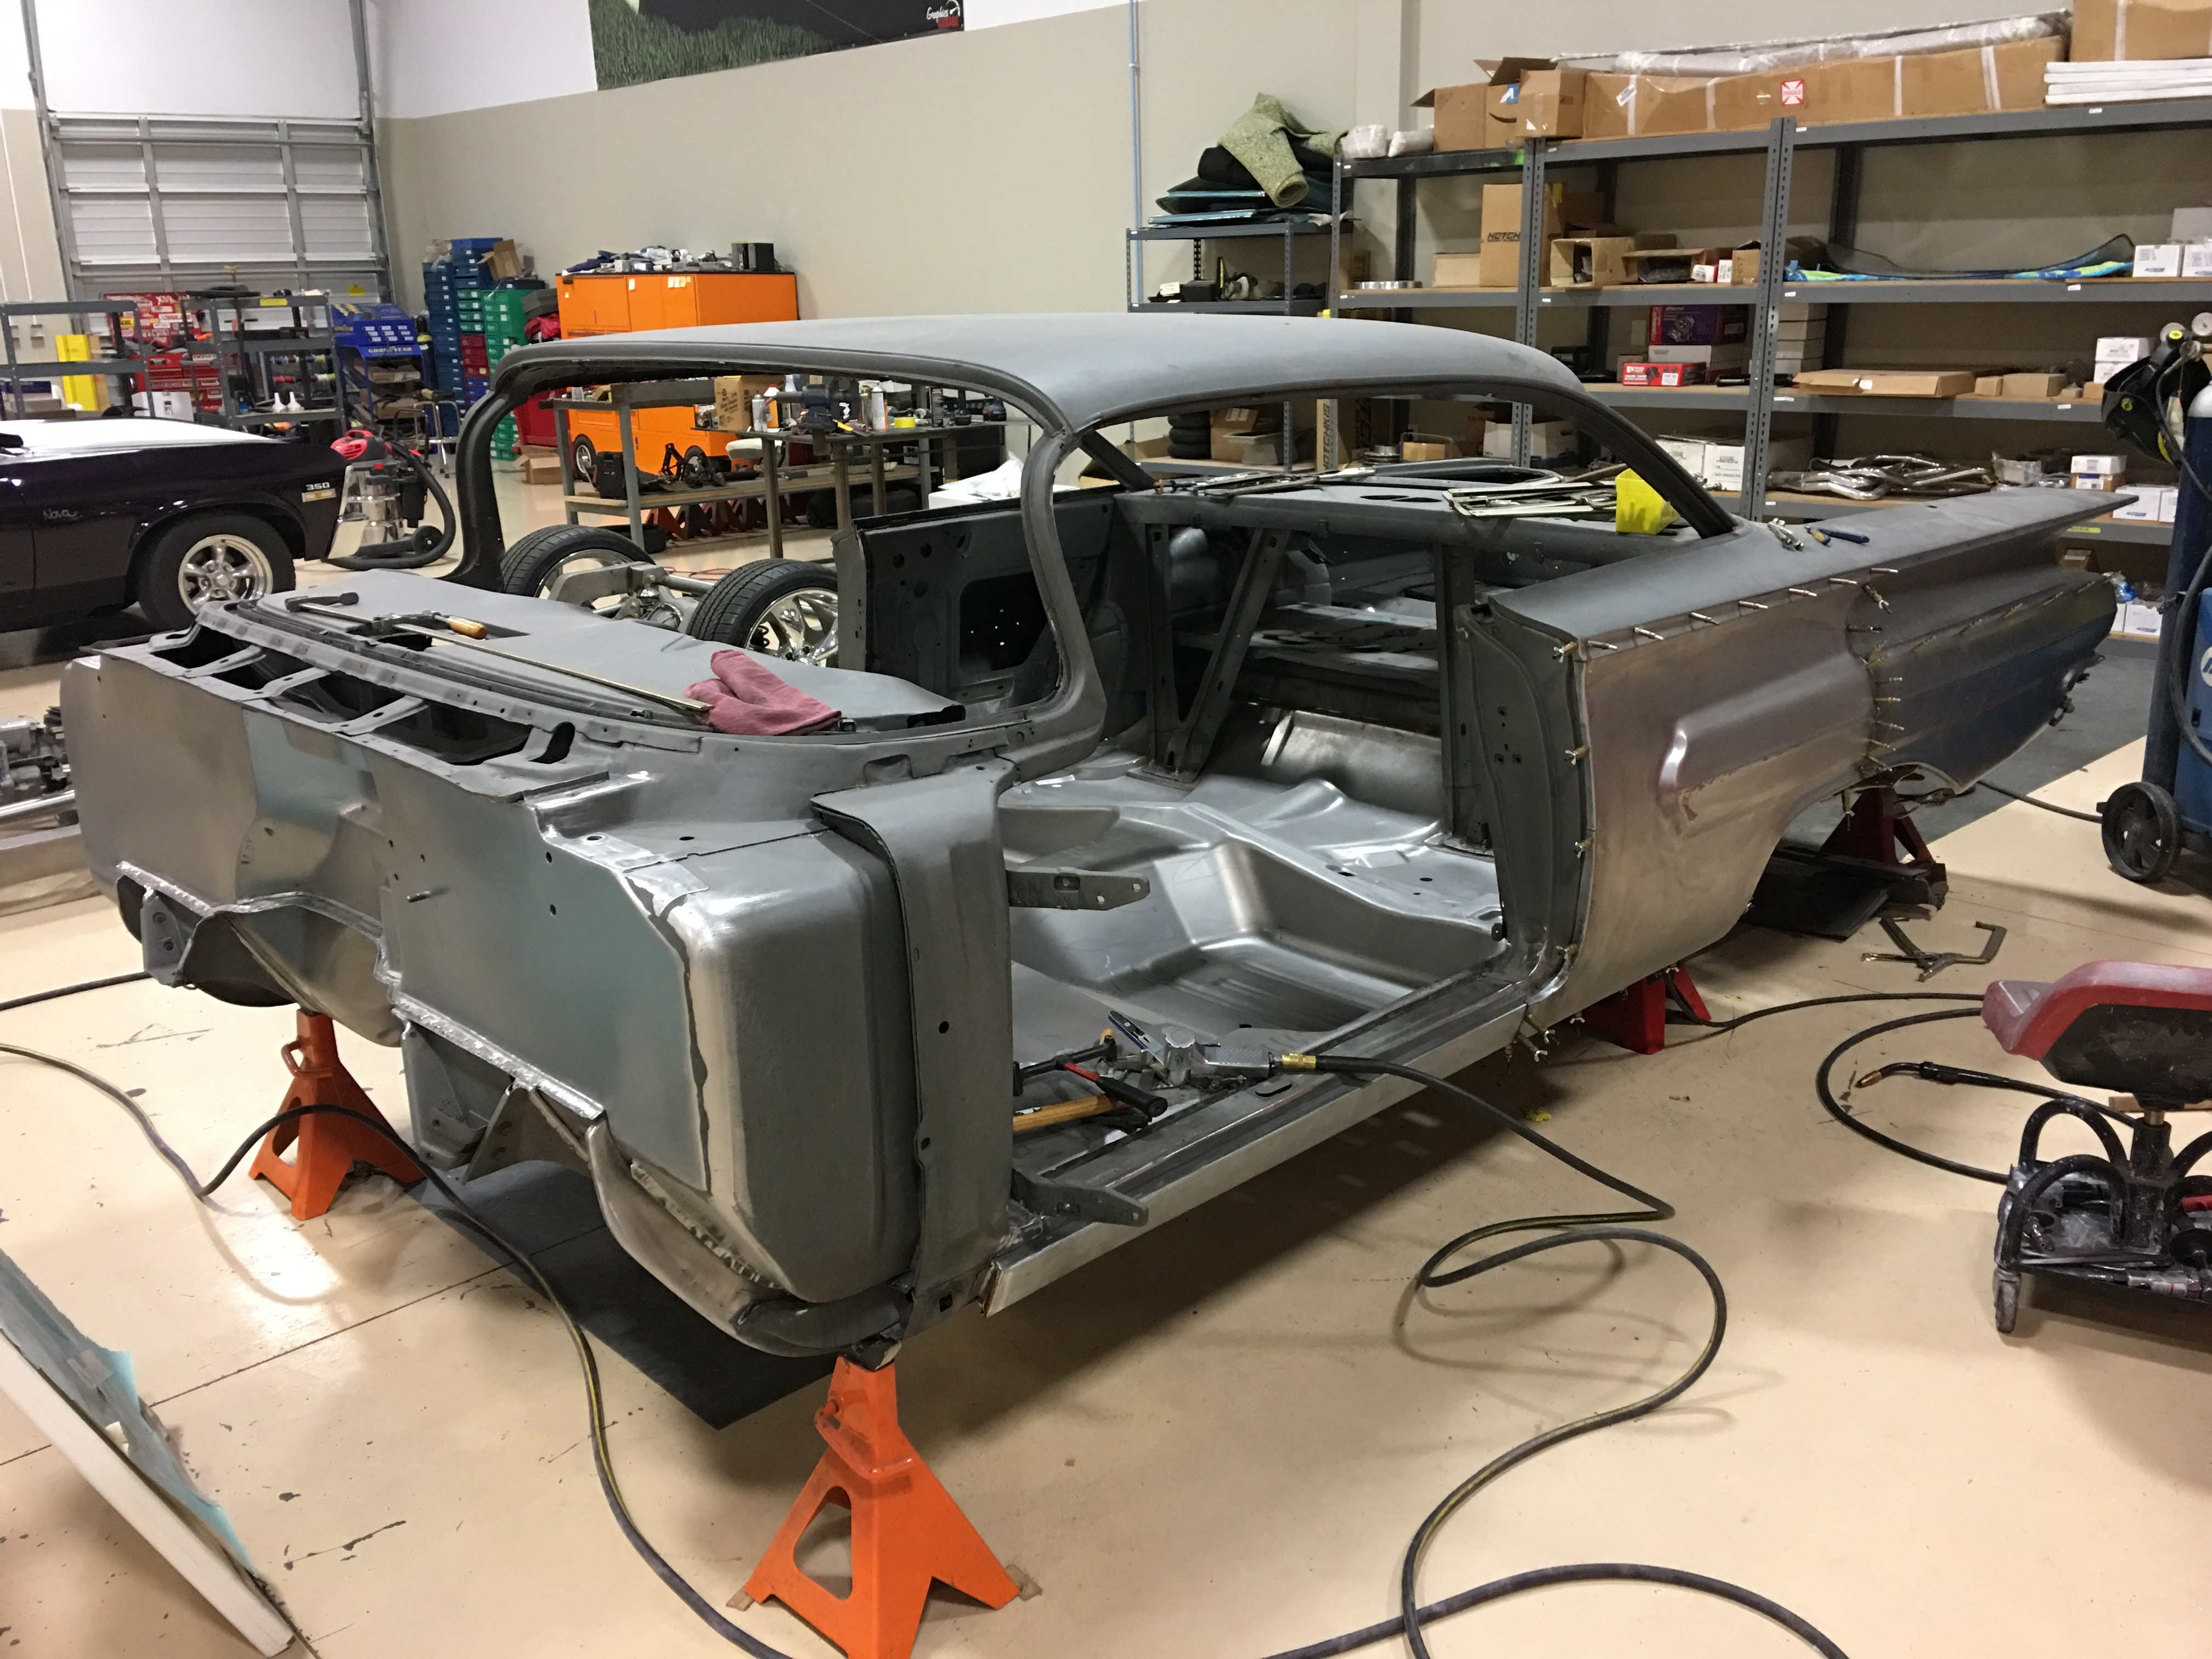 1960 Chevrolet Impala Build - Fabrication (Part 2) | RK